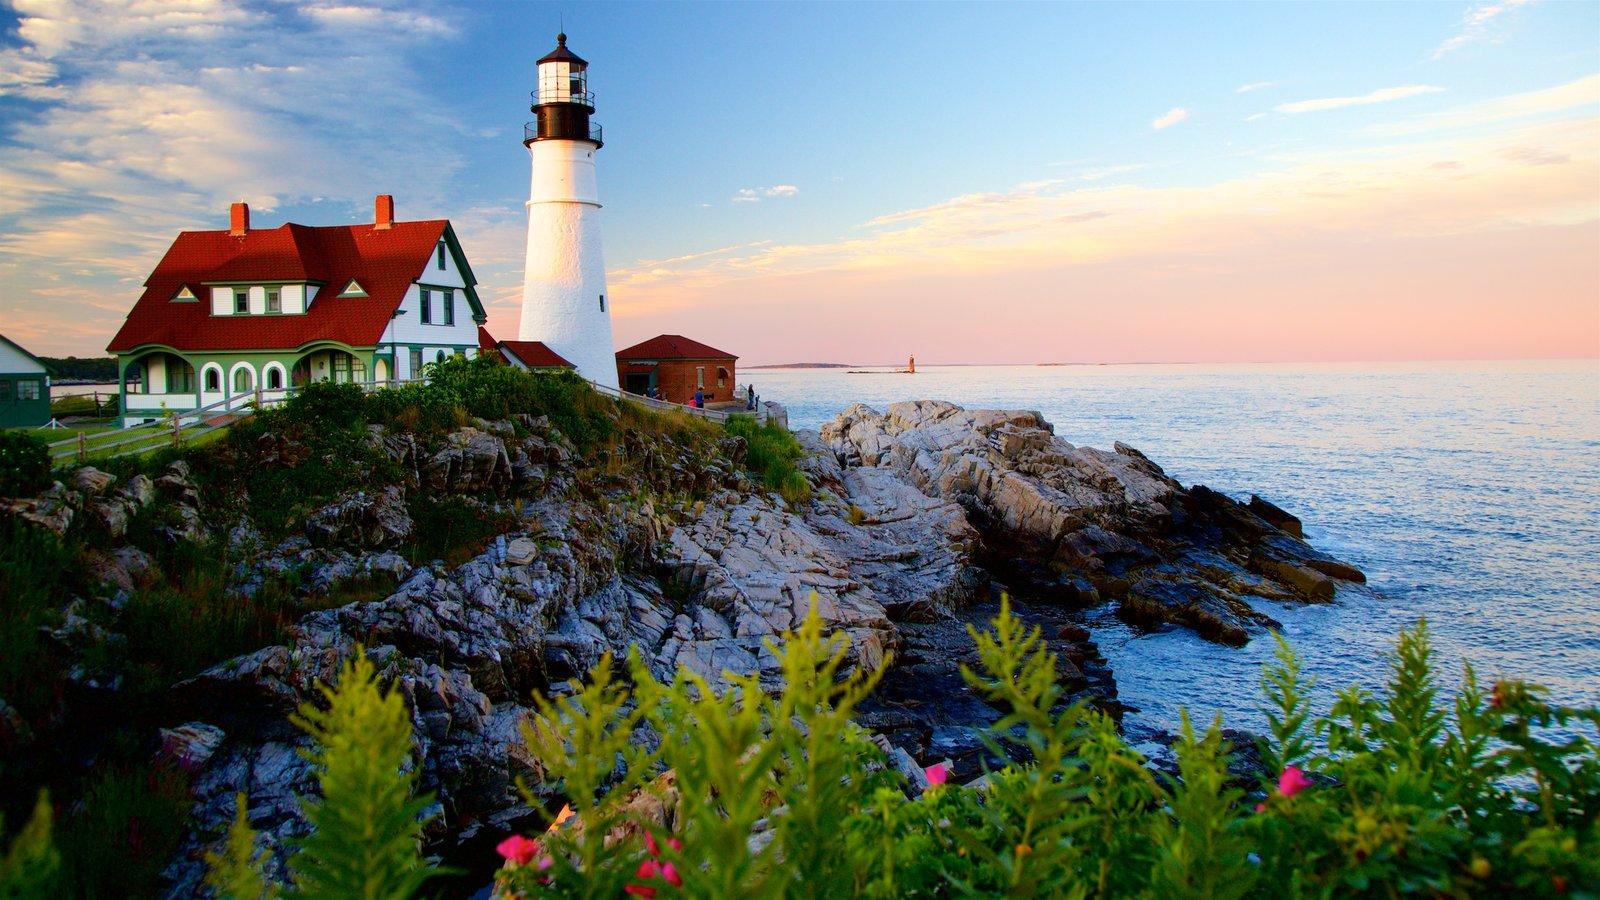 Portland Head Light featuring a lighthouse, rocky coastline and a sunset